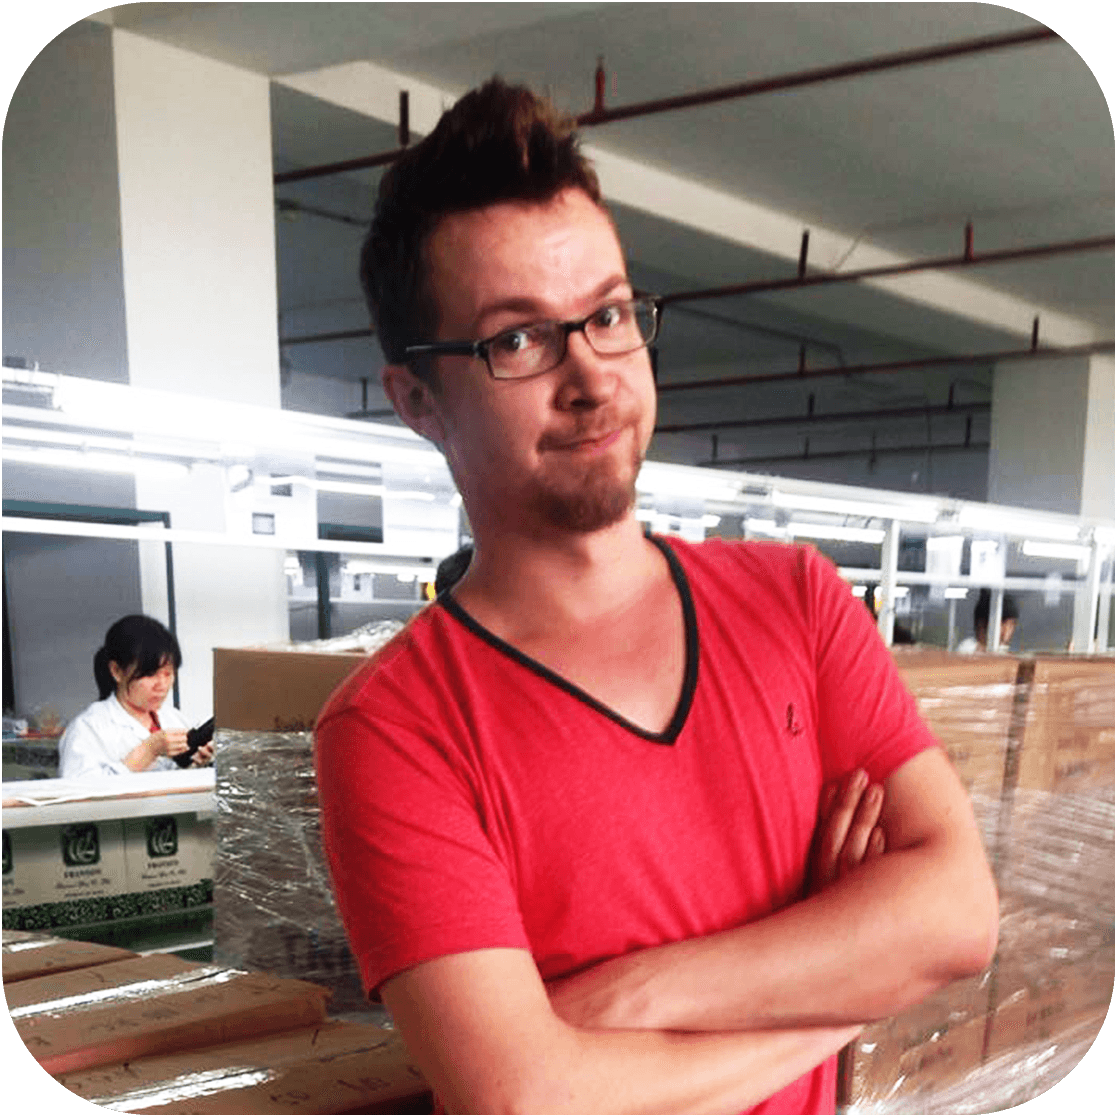 Hatch QC expert Aleksey Surovtsev